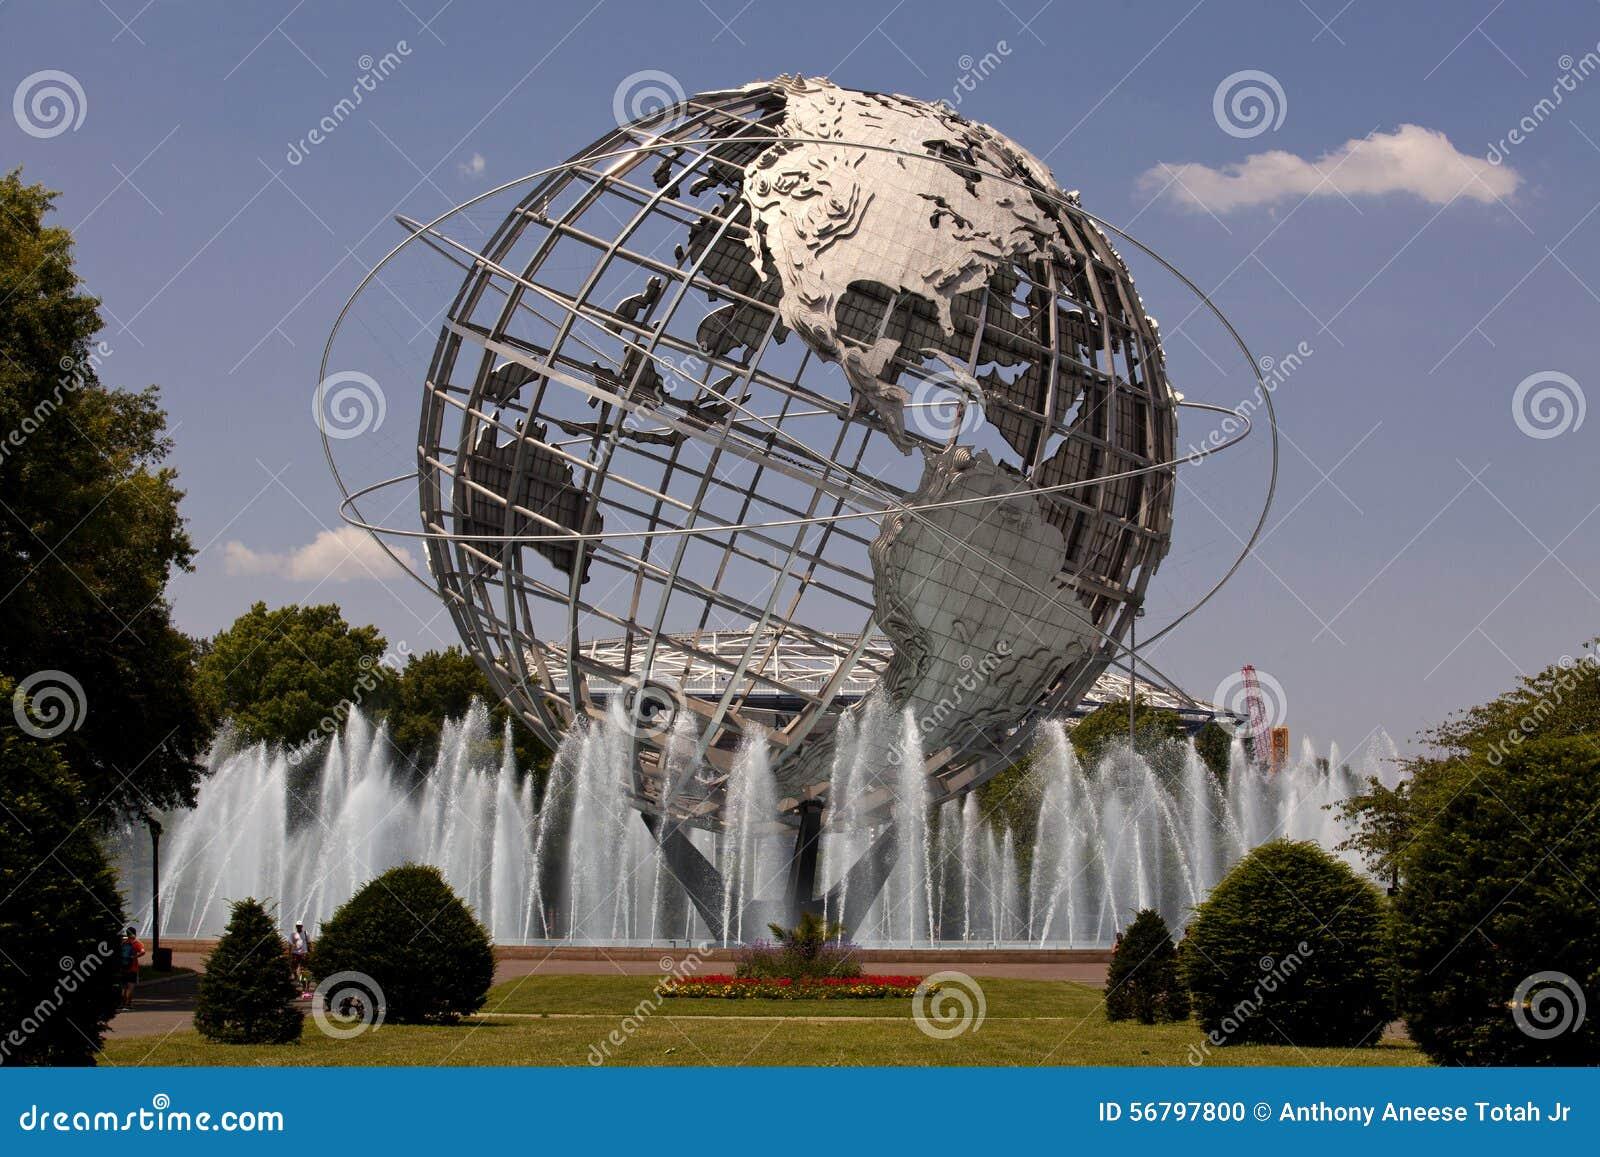 Unisphere in Fushing Meadows Corona Park, Queens - New York